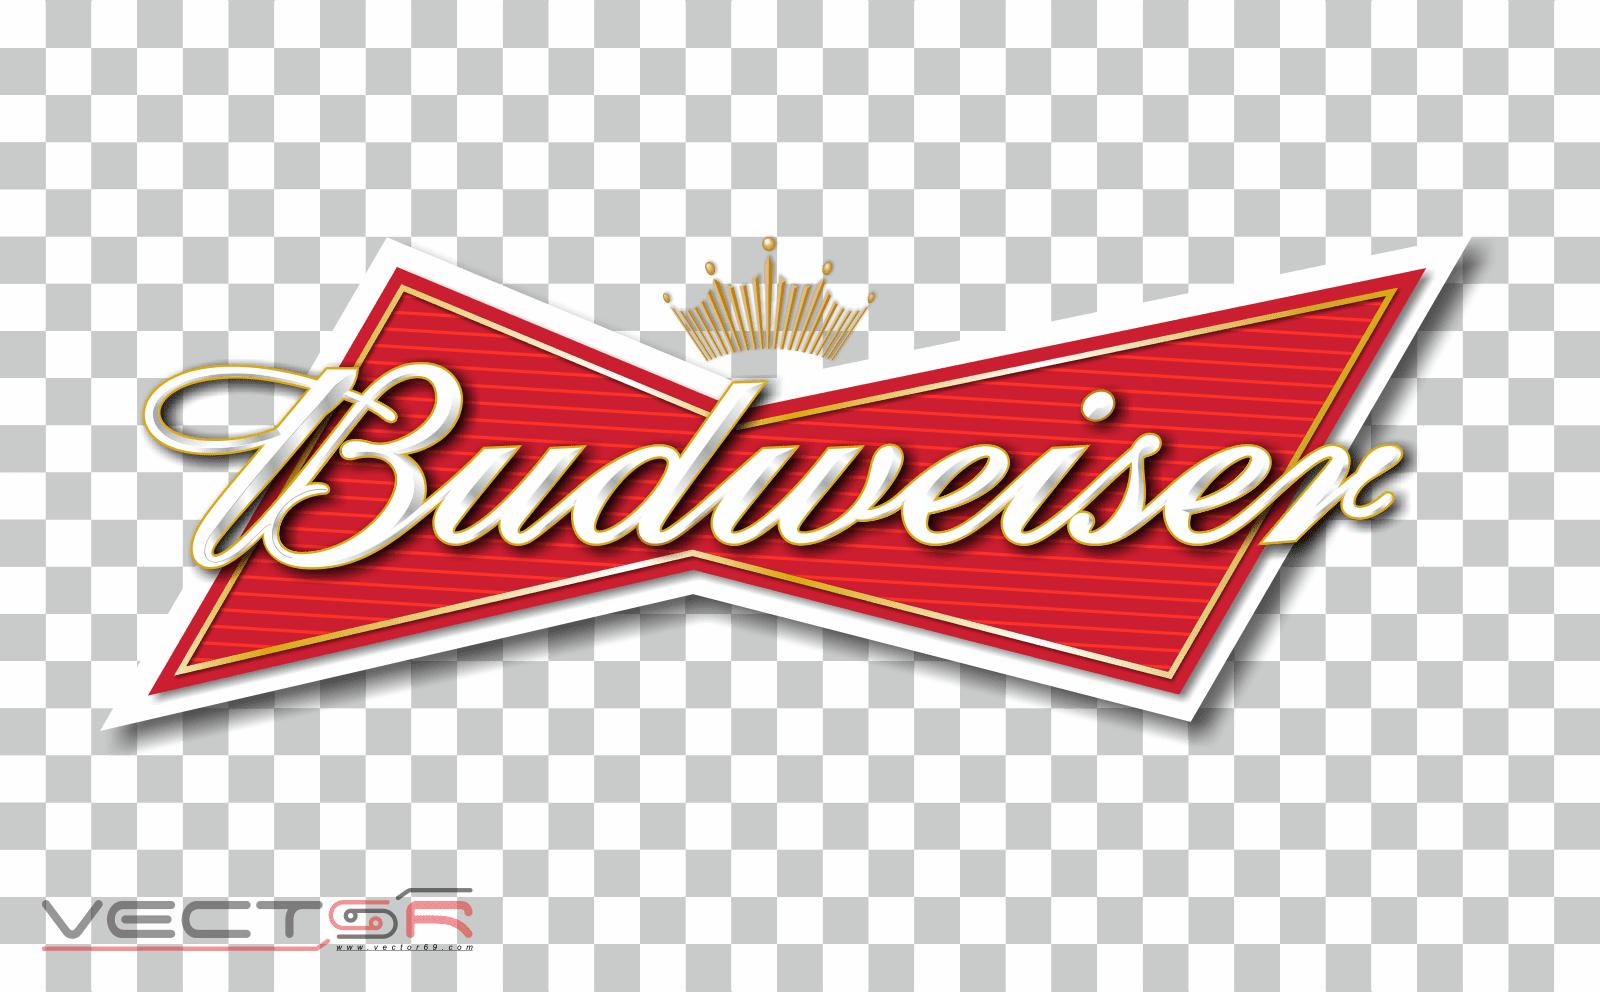 Budweiser (2011) Logo - Download .PNG (Portable Network Graphics) Transparent Images